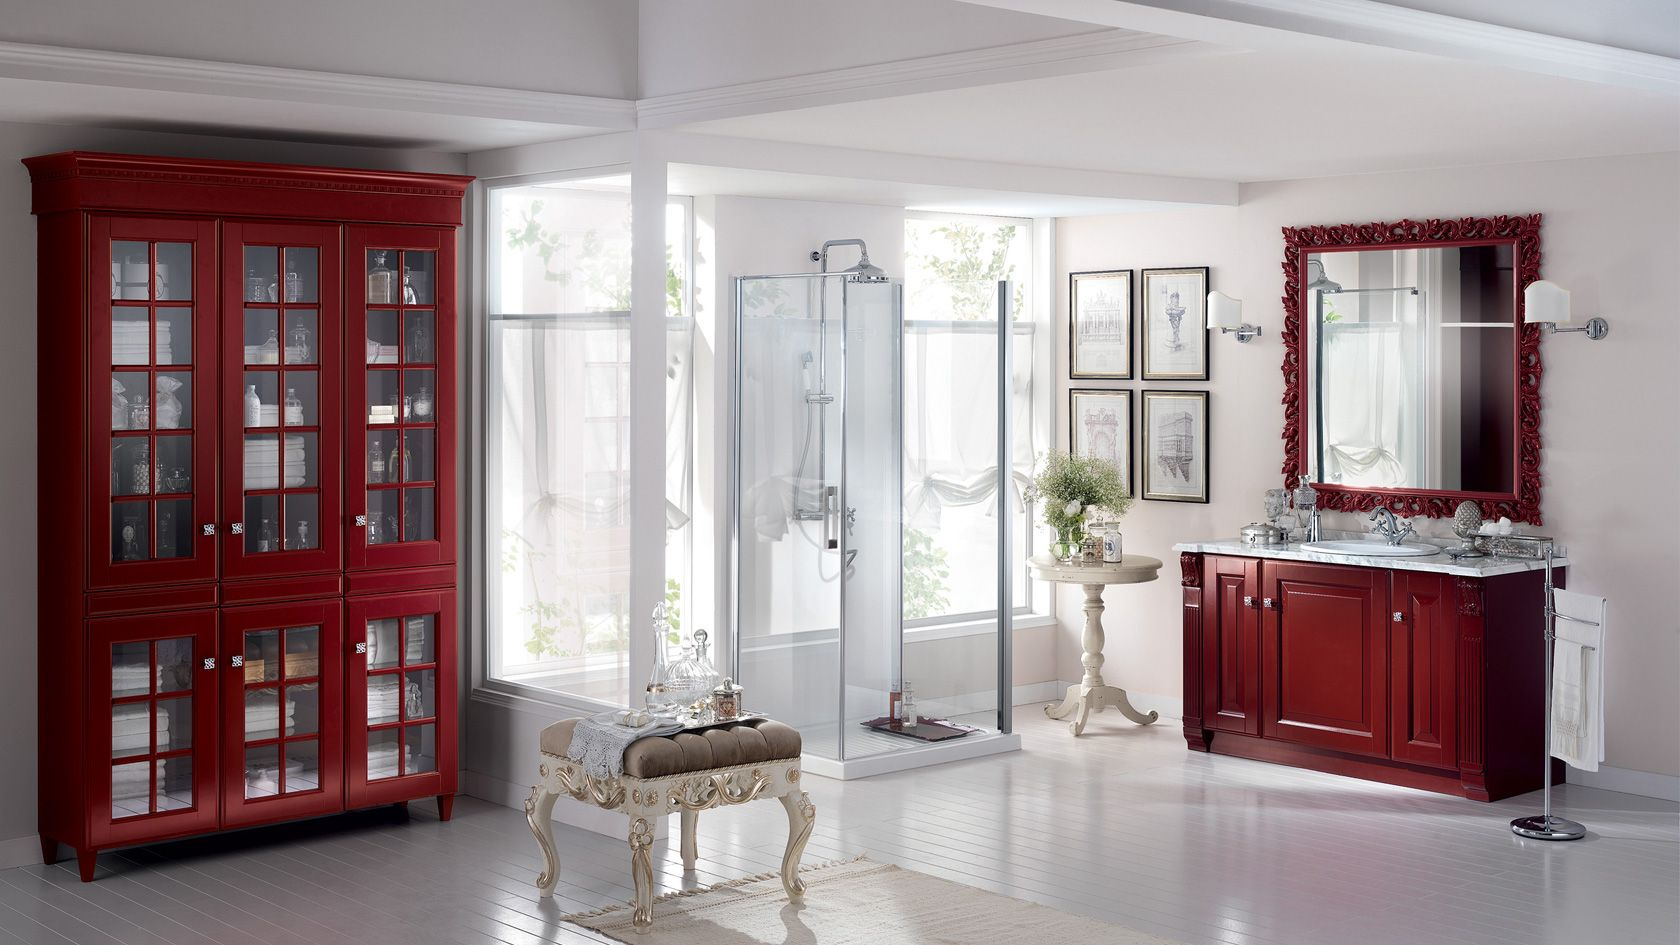 Bathroom Baltimora Scavolini | Design | Pinterest | Bathroom designs